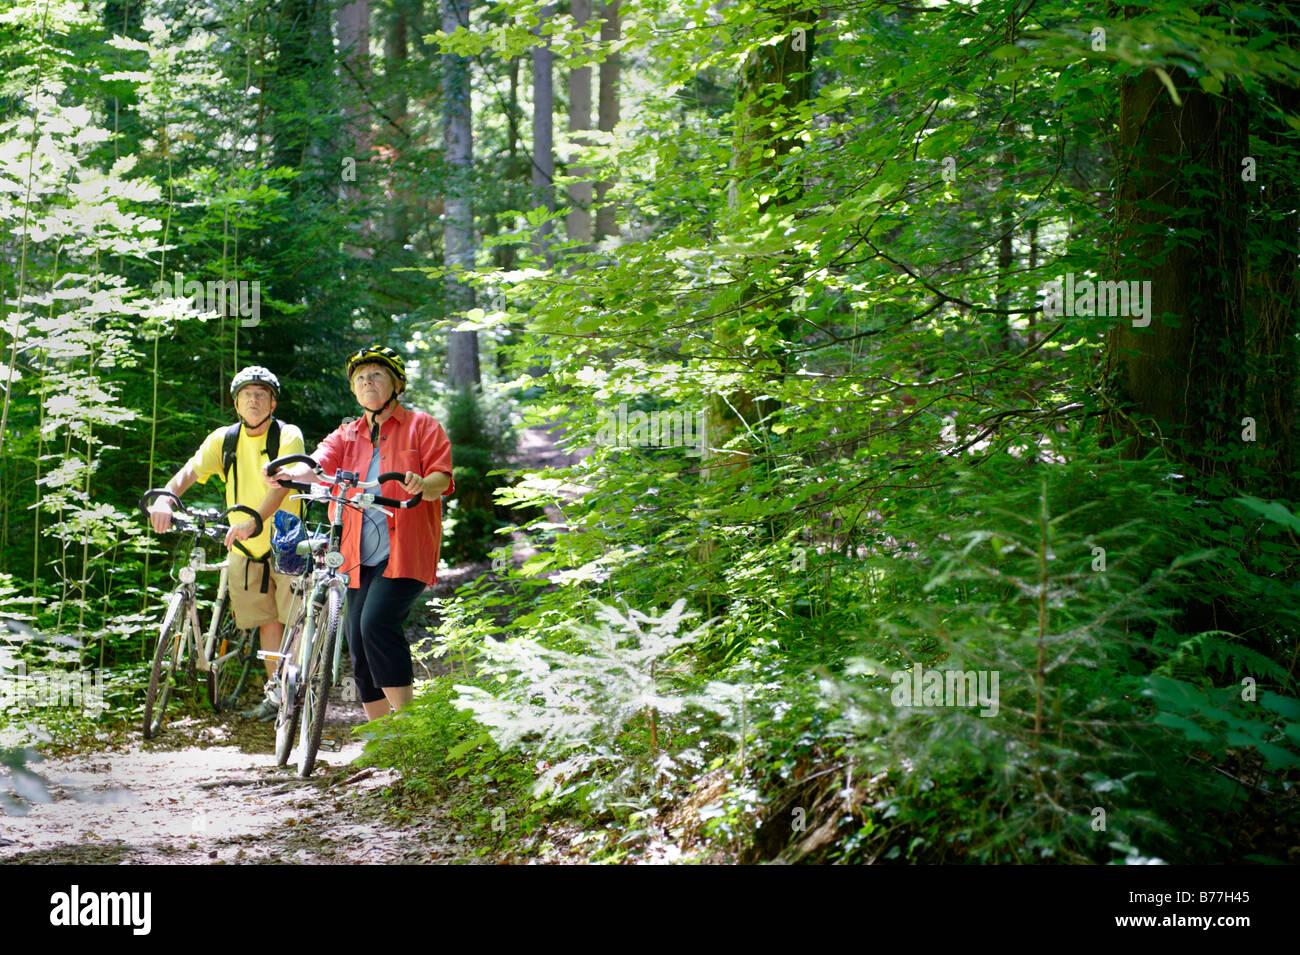 Cyclists in the wildlife park, Paterzeller Eibenwald, yew tree forest near Wessobrunn, Upper Bavaria, Bavaria, Germany, - Stock Image